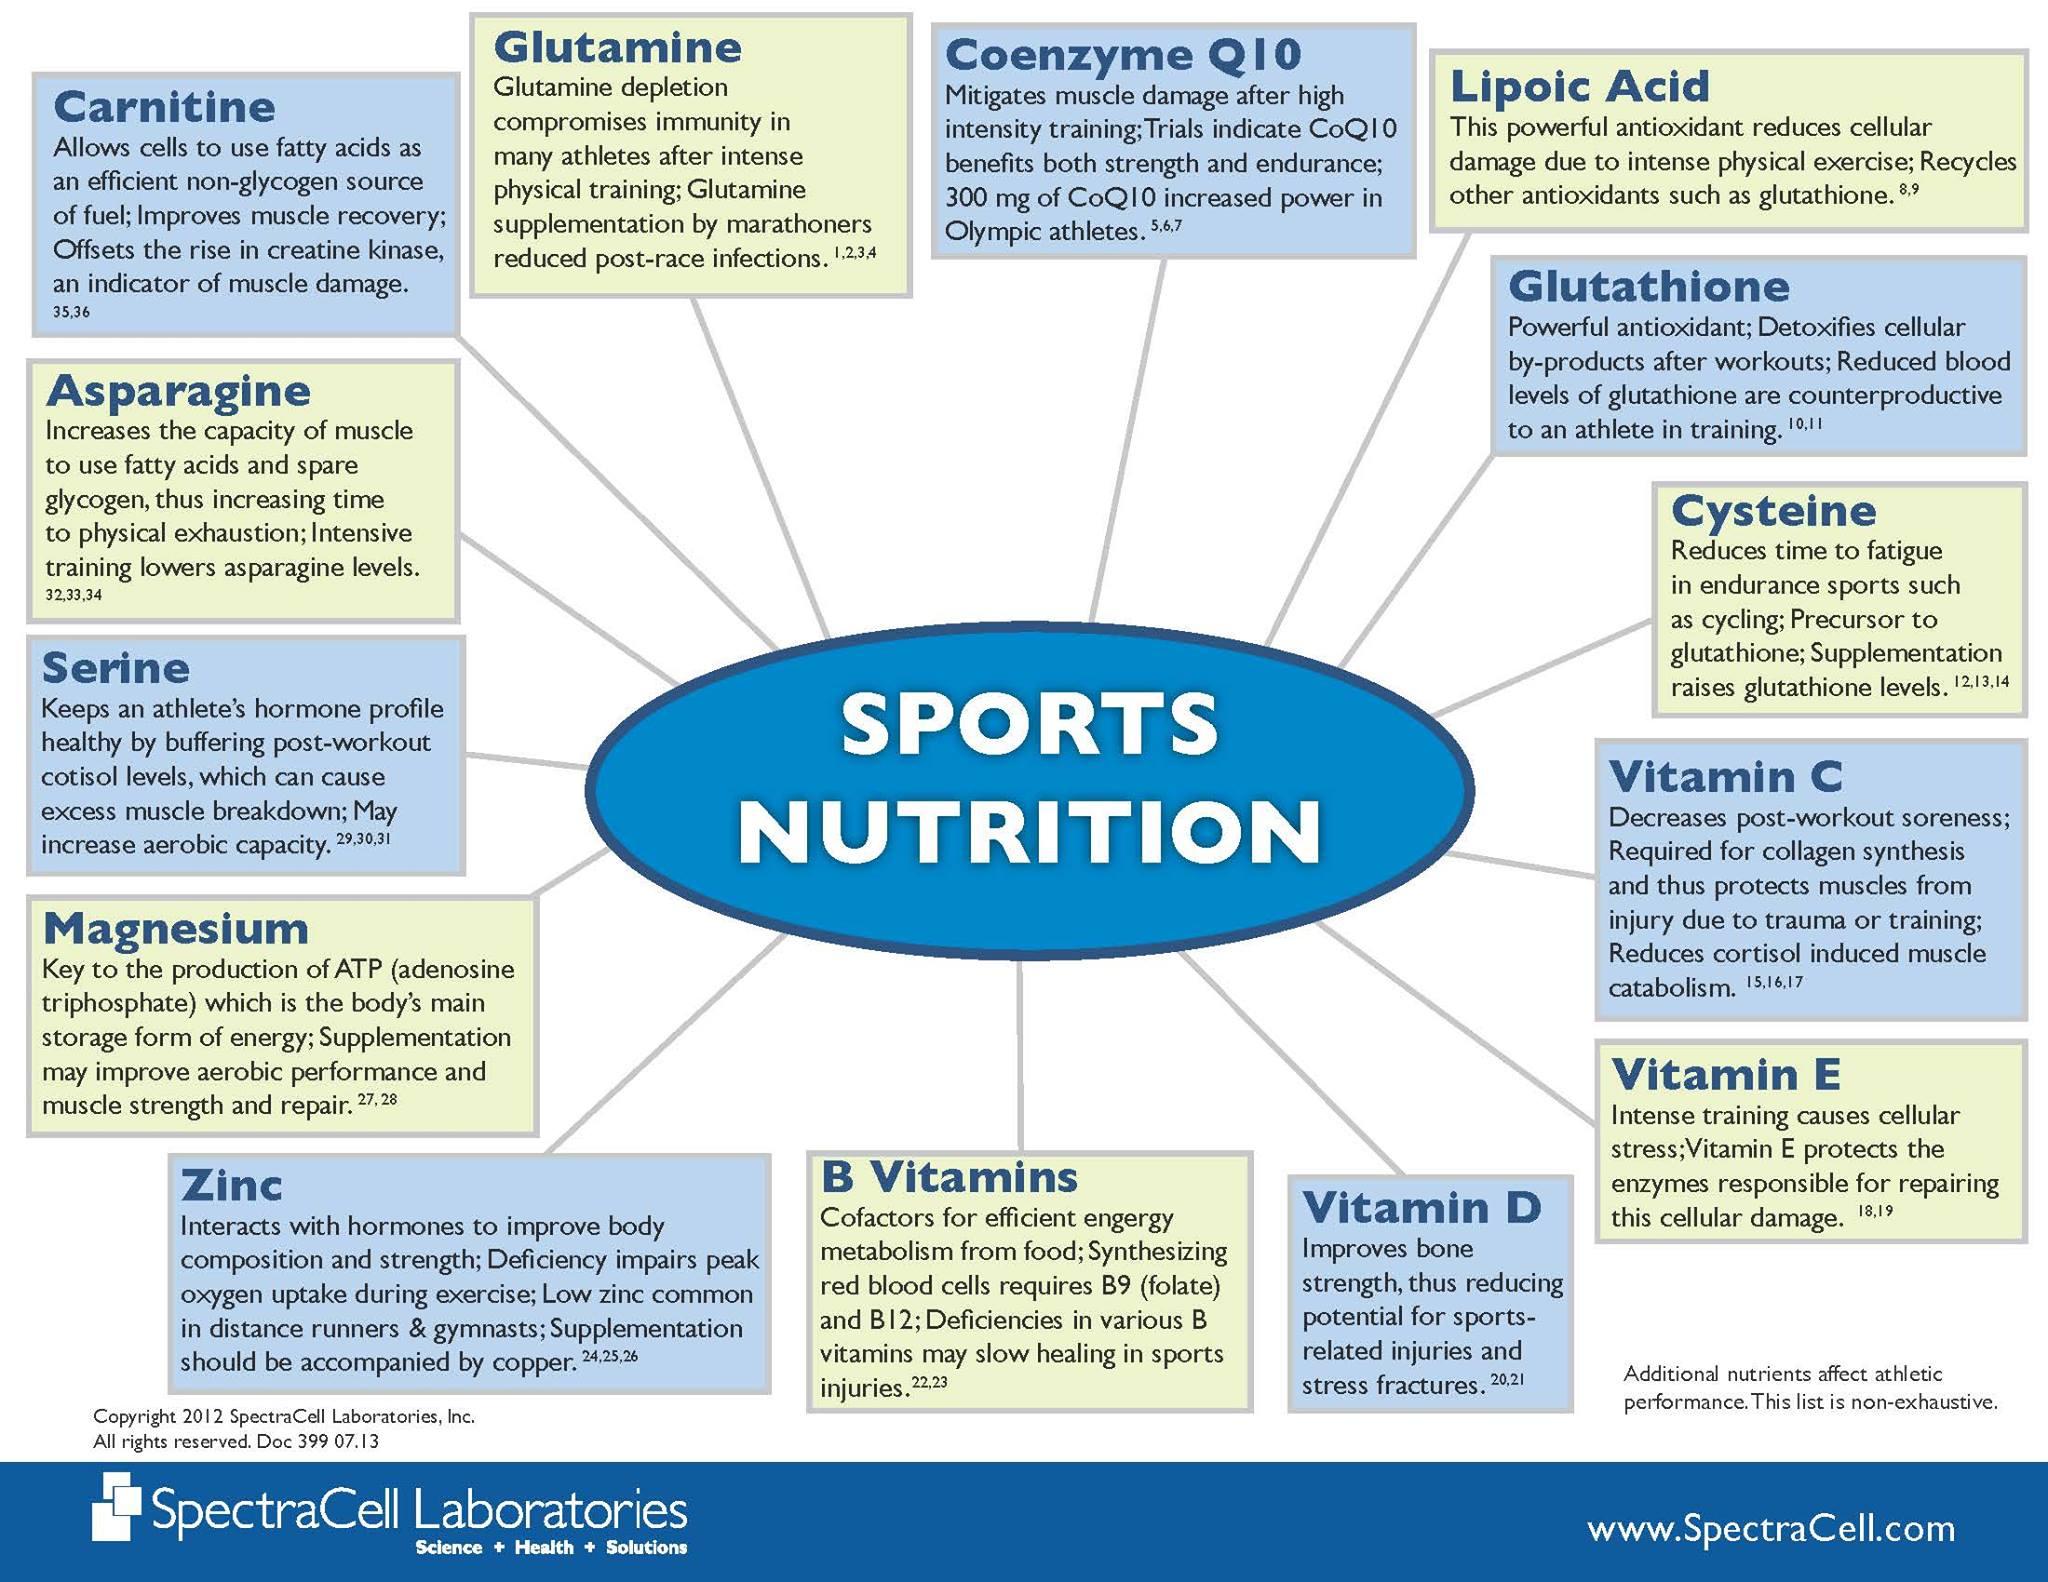 Know Your Nutritional Needs Revolution Health Wellness